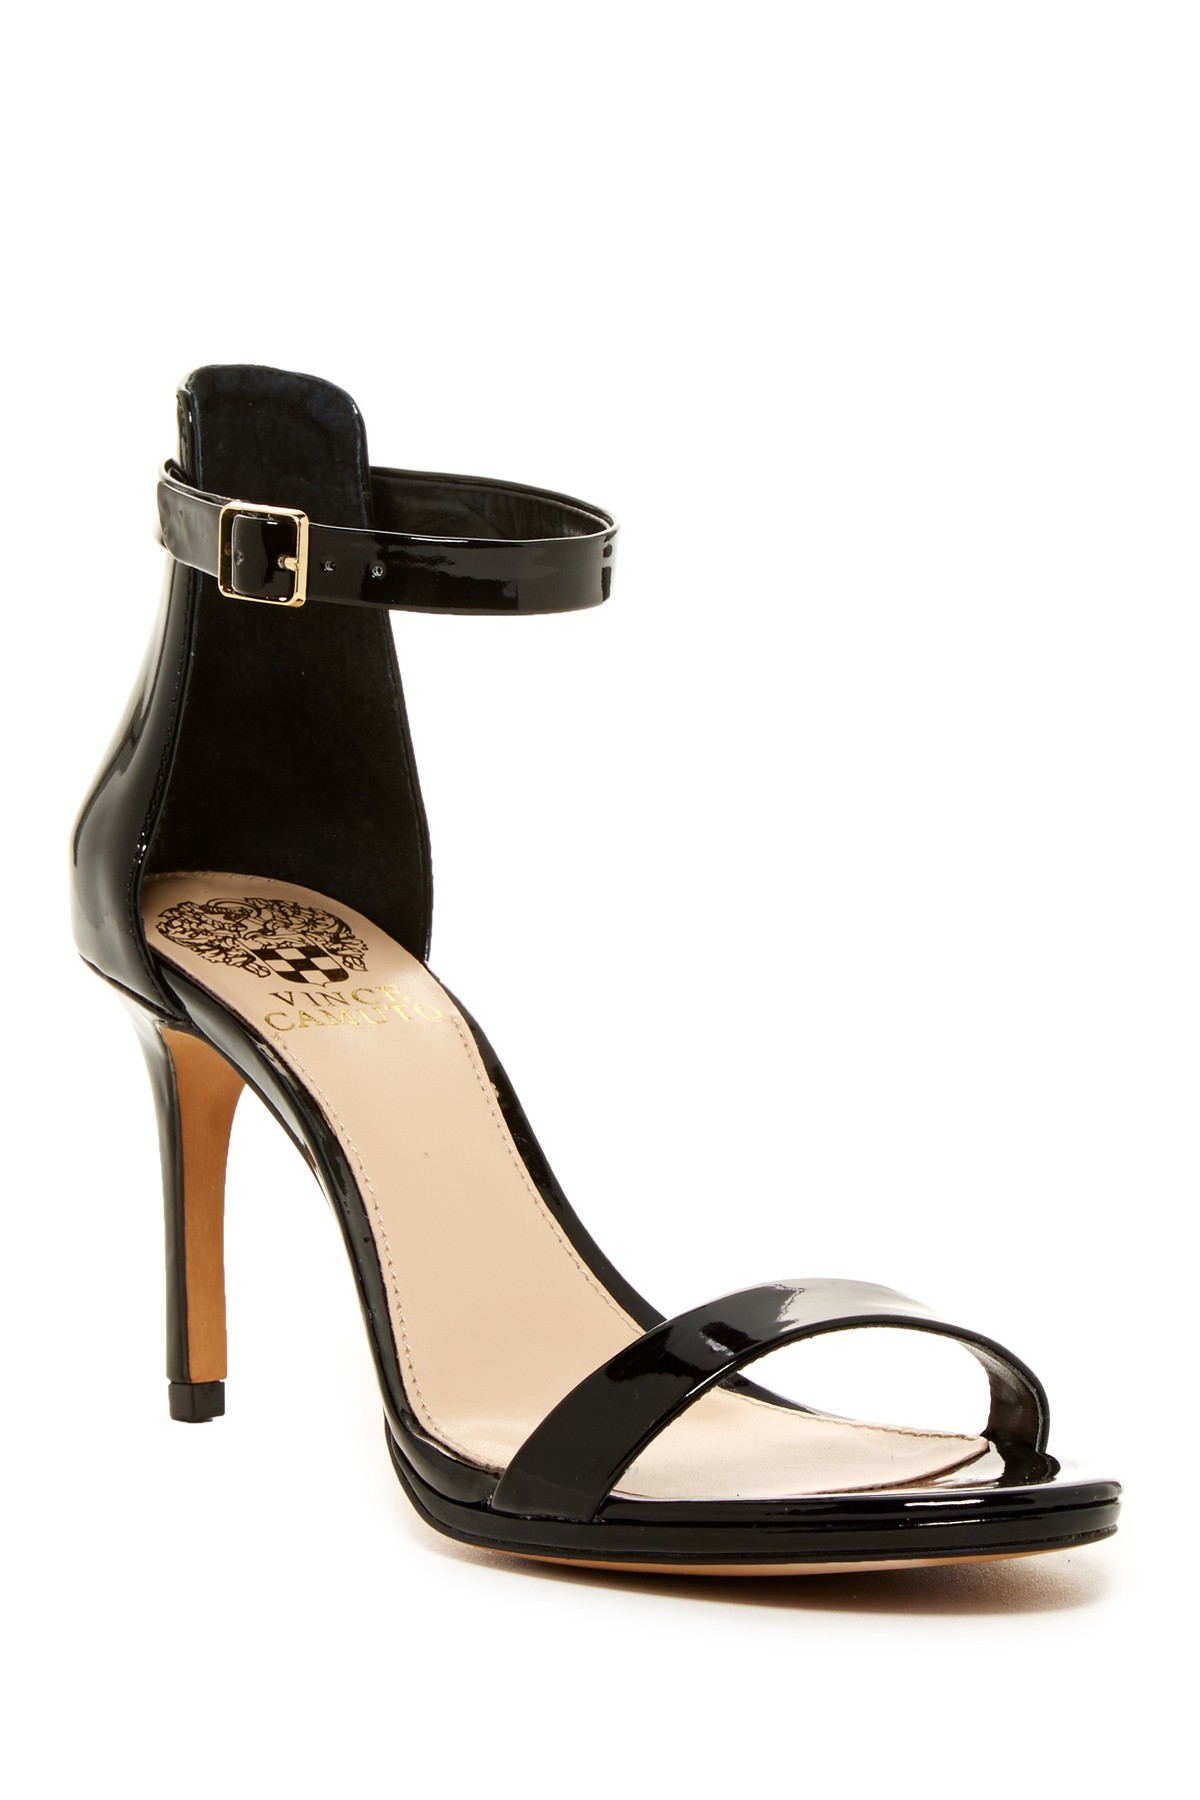 Vince Camuto Jesta High Heel Sandal In Black Black 01 Lyst